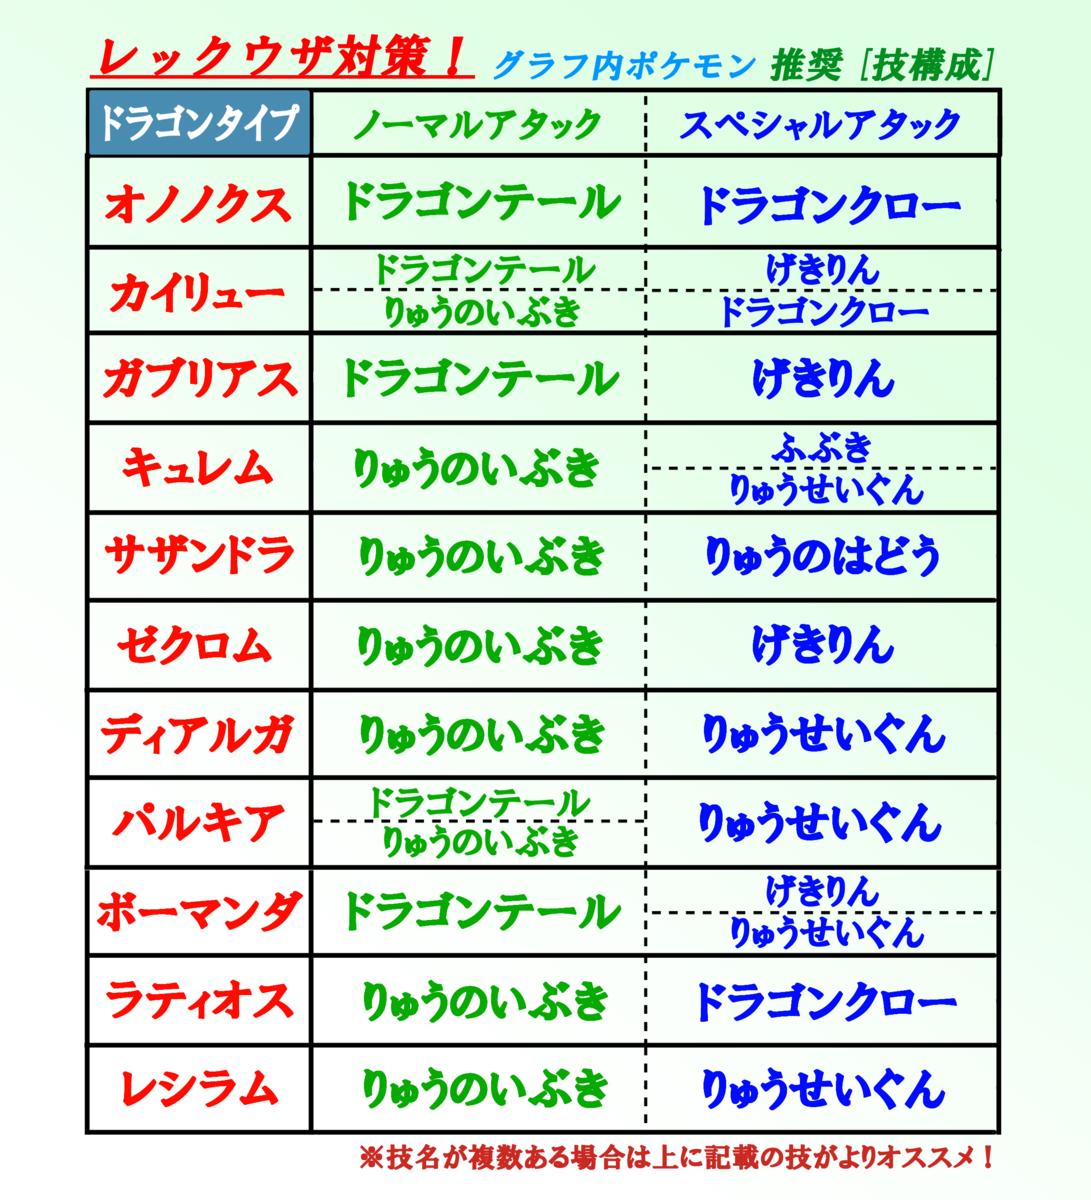 f:id:Kazumin0331:20200731231814p:plain